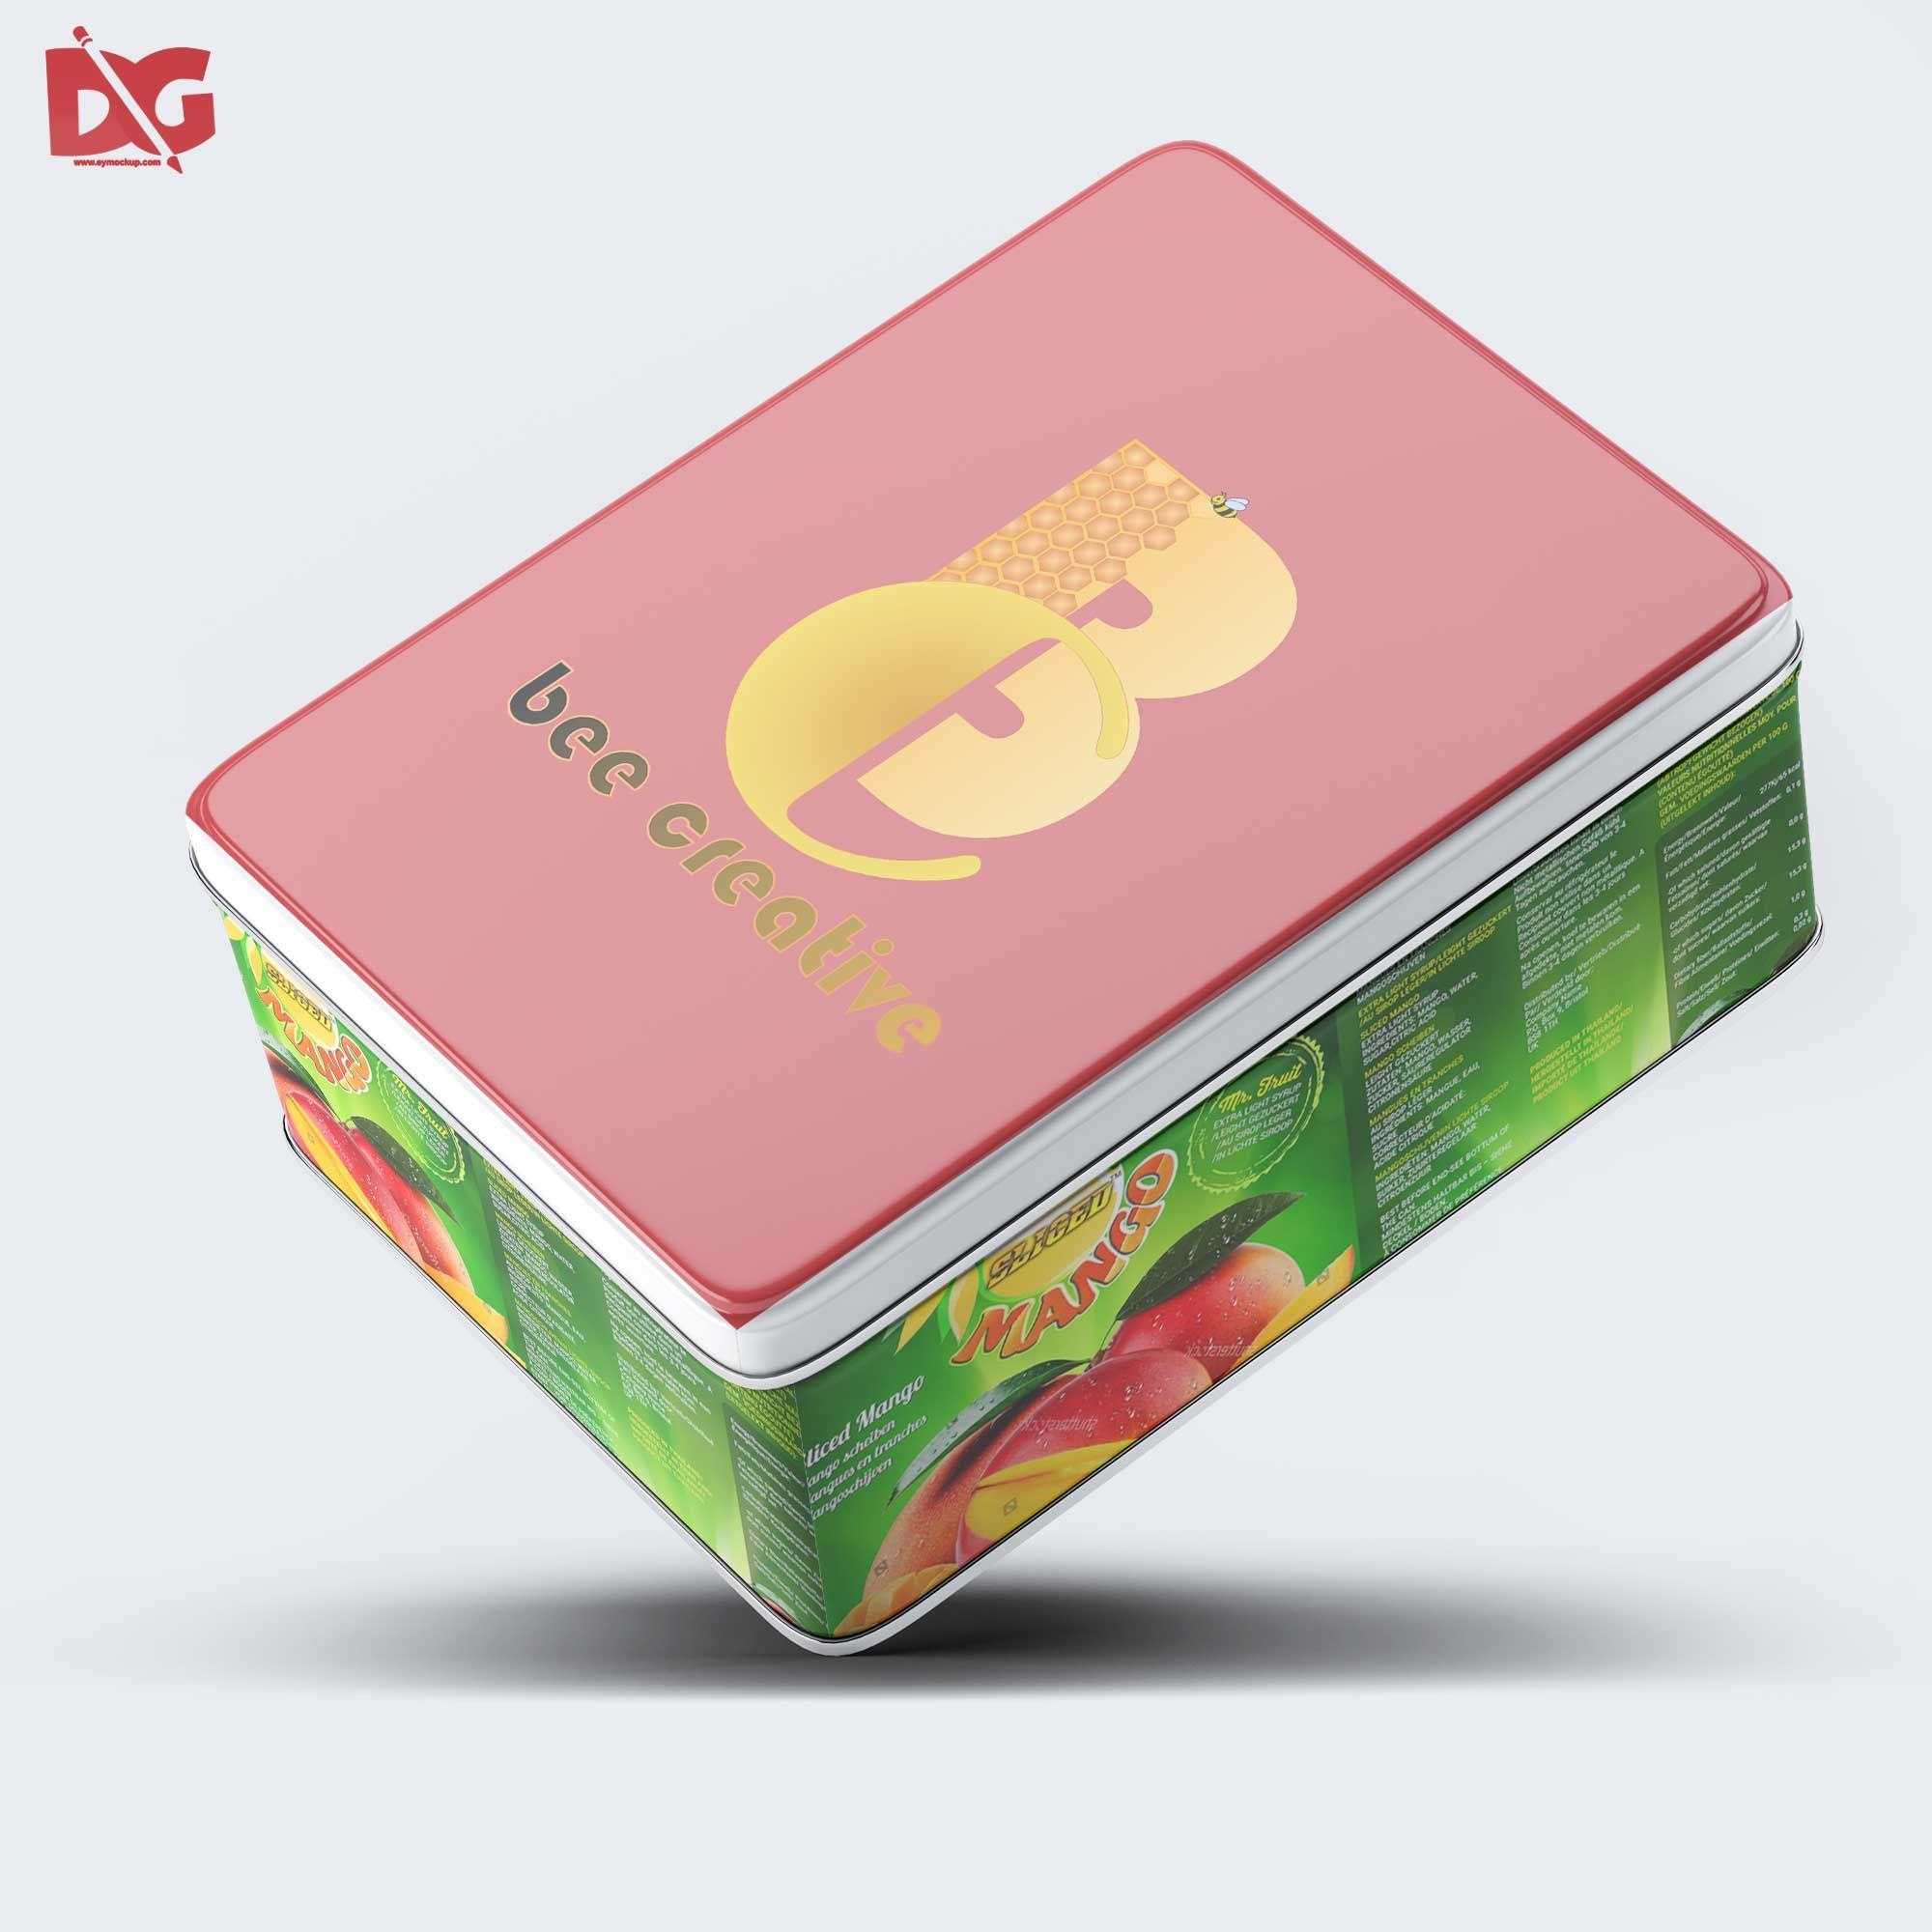 Download Tilt Rectangular Box Packaging Mockup Free Logo Mockup Logo Design Mockup Free Logo Psd